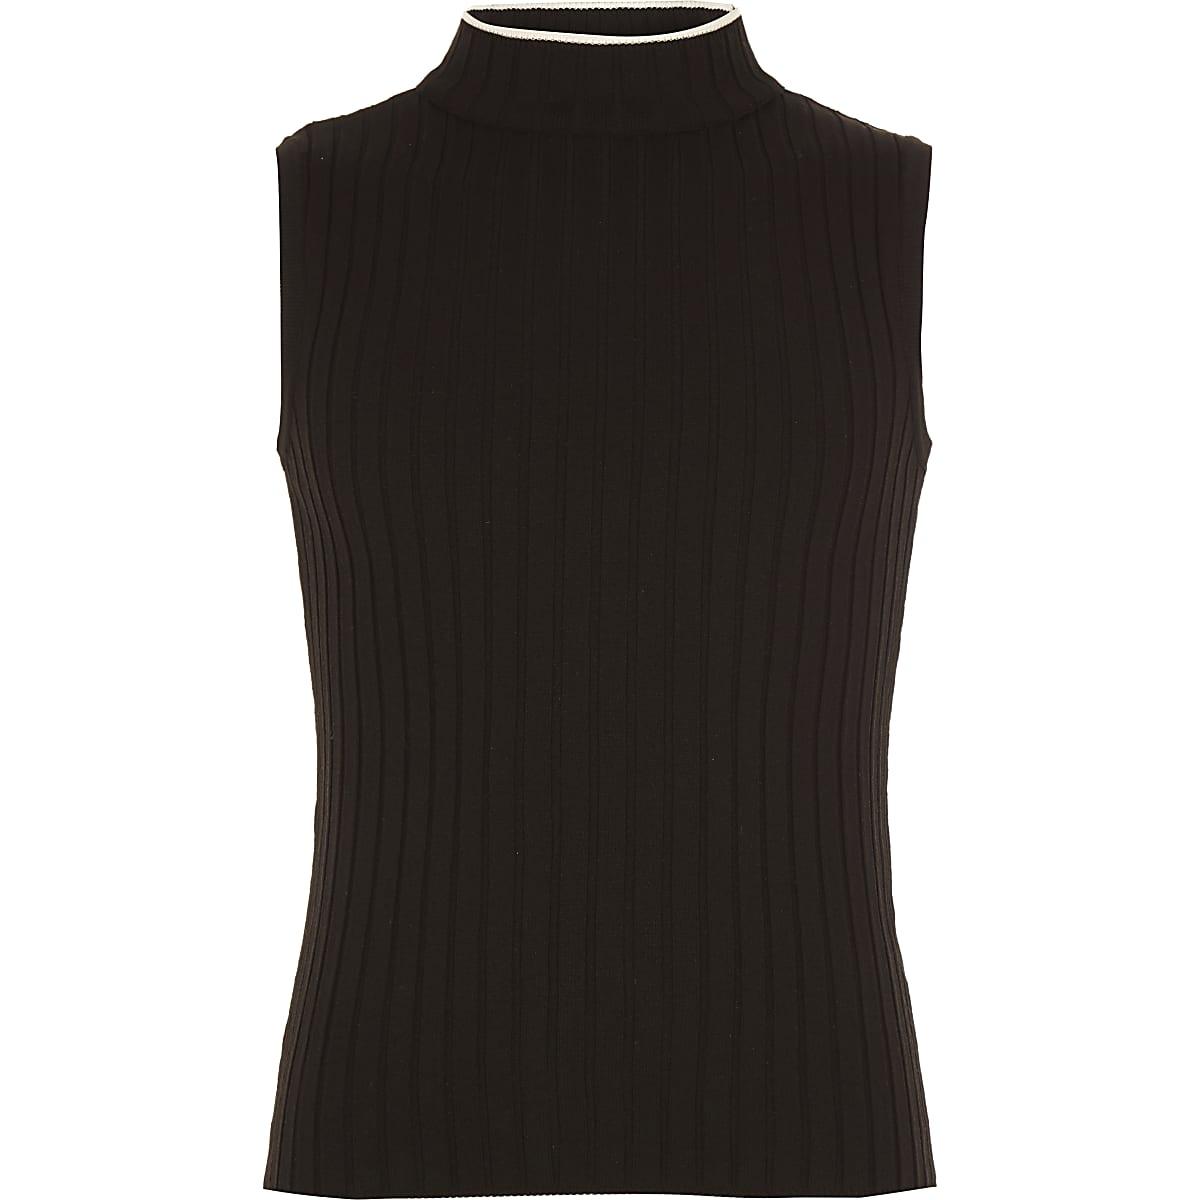 Girls black rib turtle neck tank top